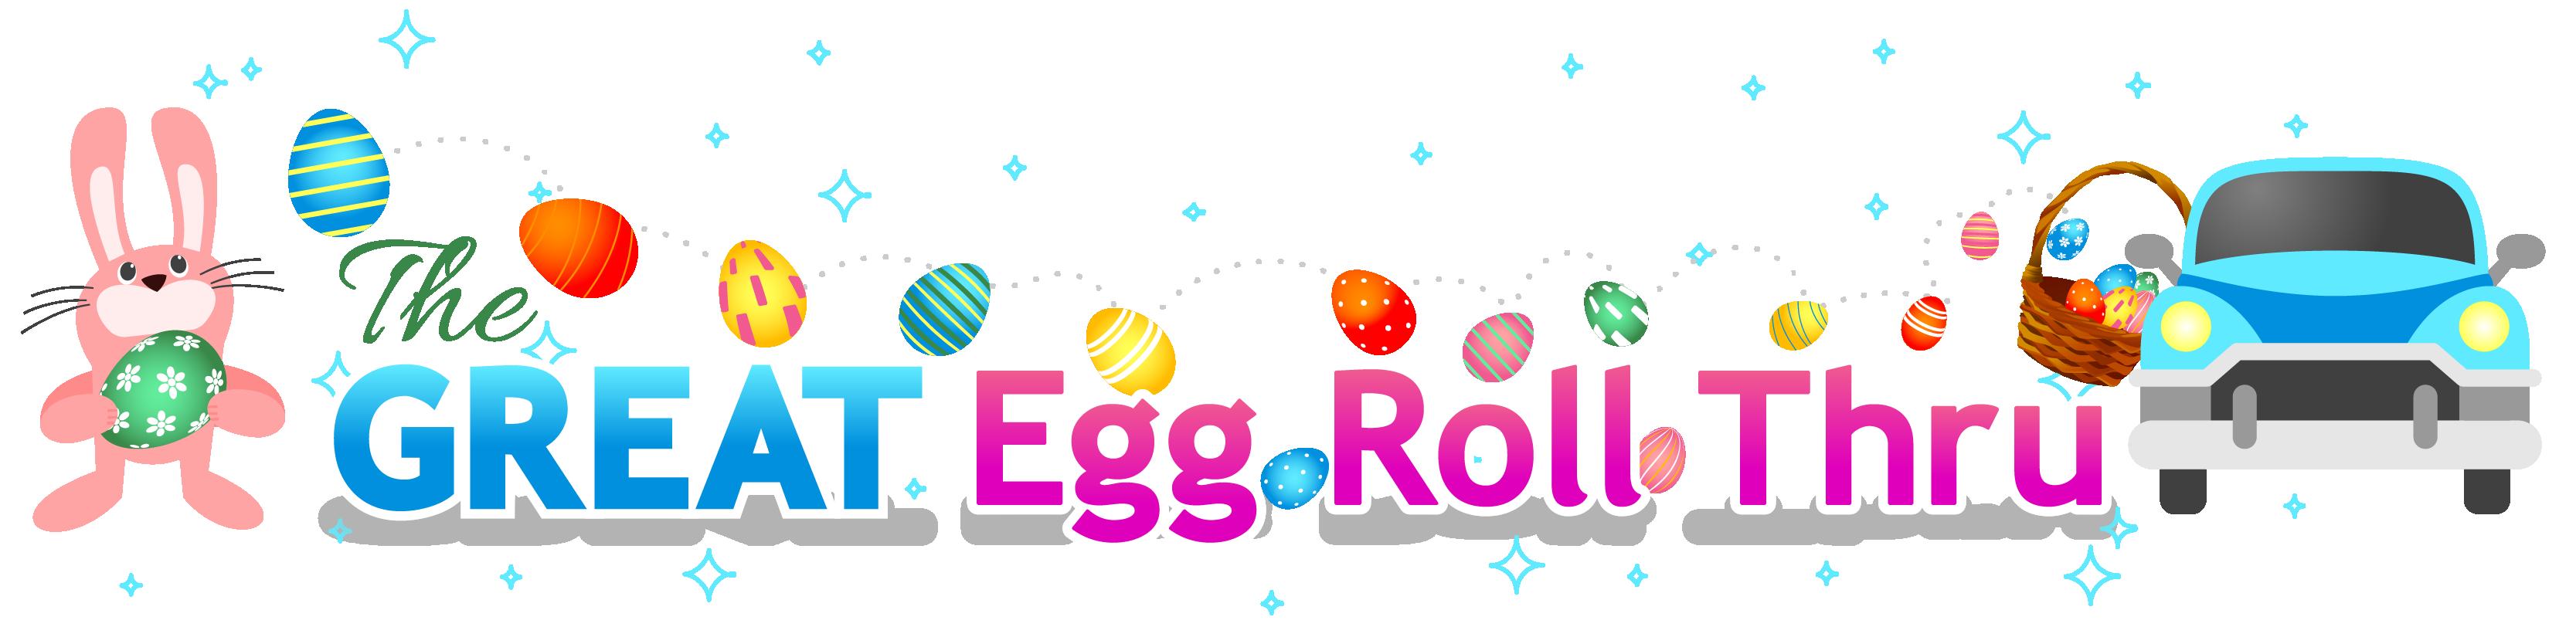 2020 Great Egg Roll Thru_Header